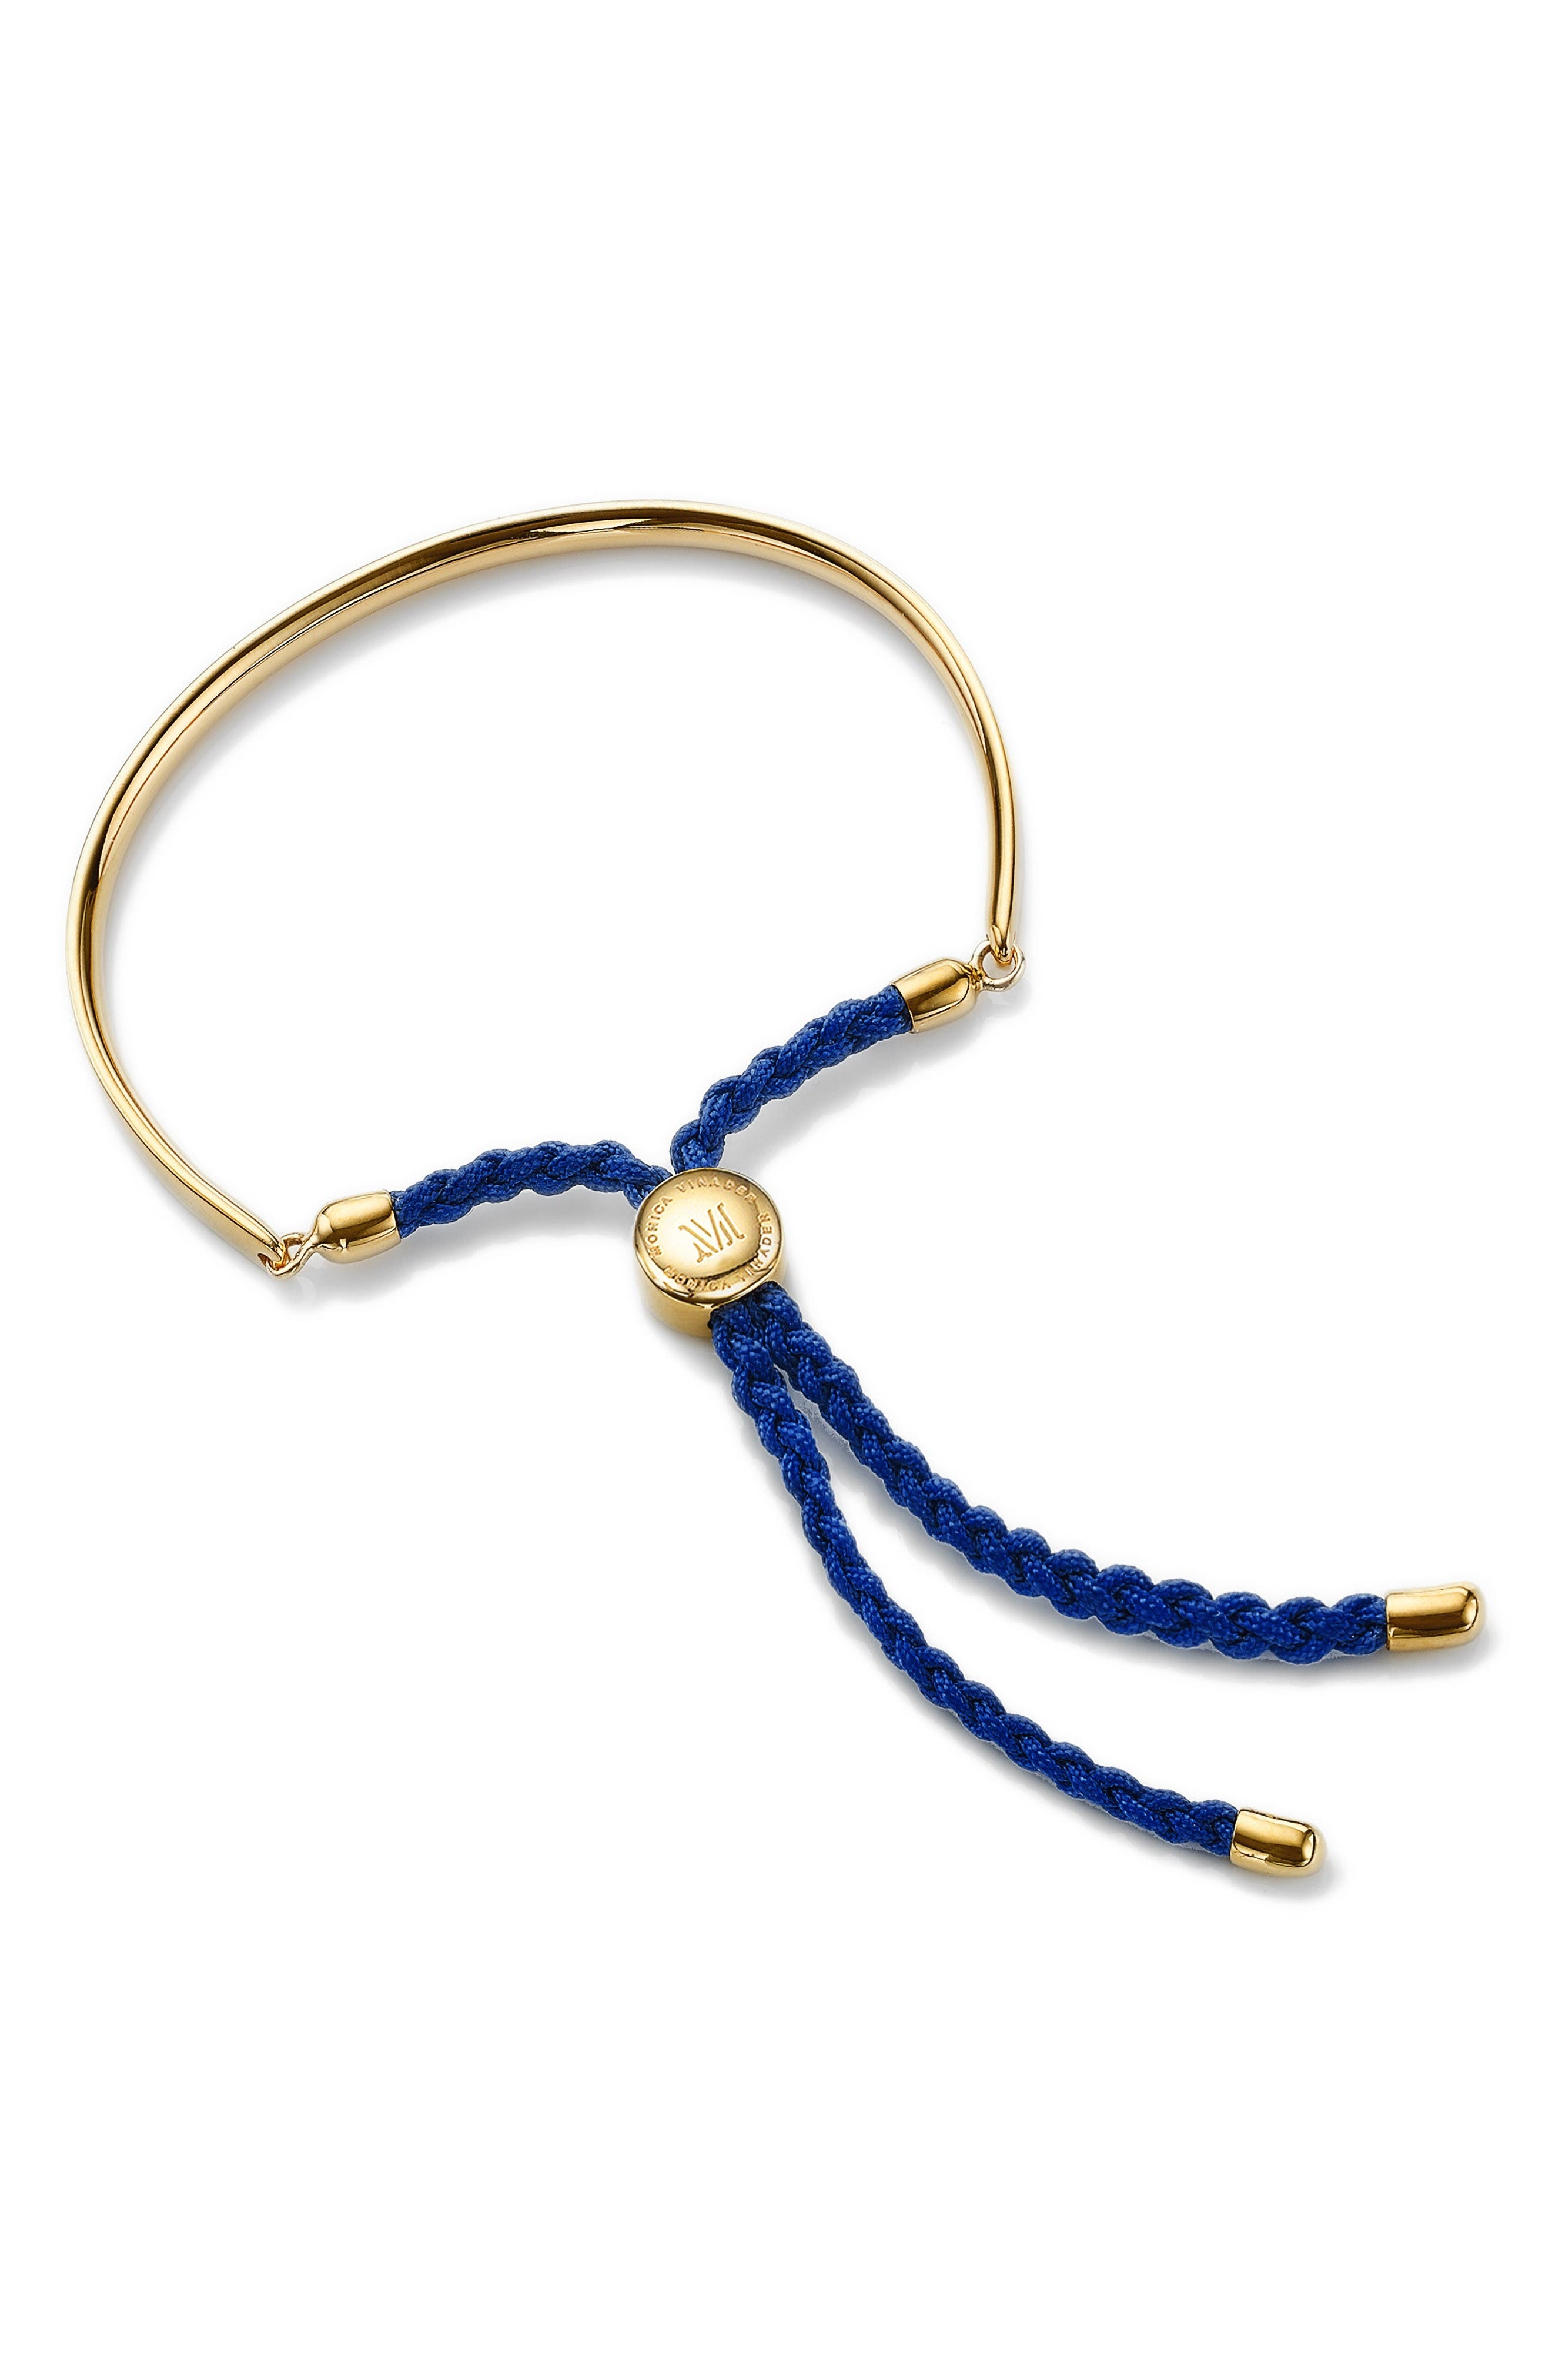 Main Image - Monica Vinader 'Fiji' Friendship Bracelet